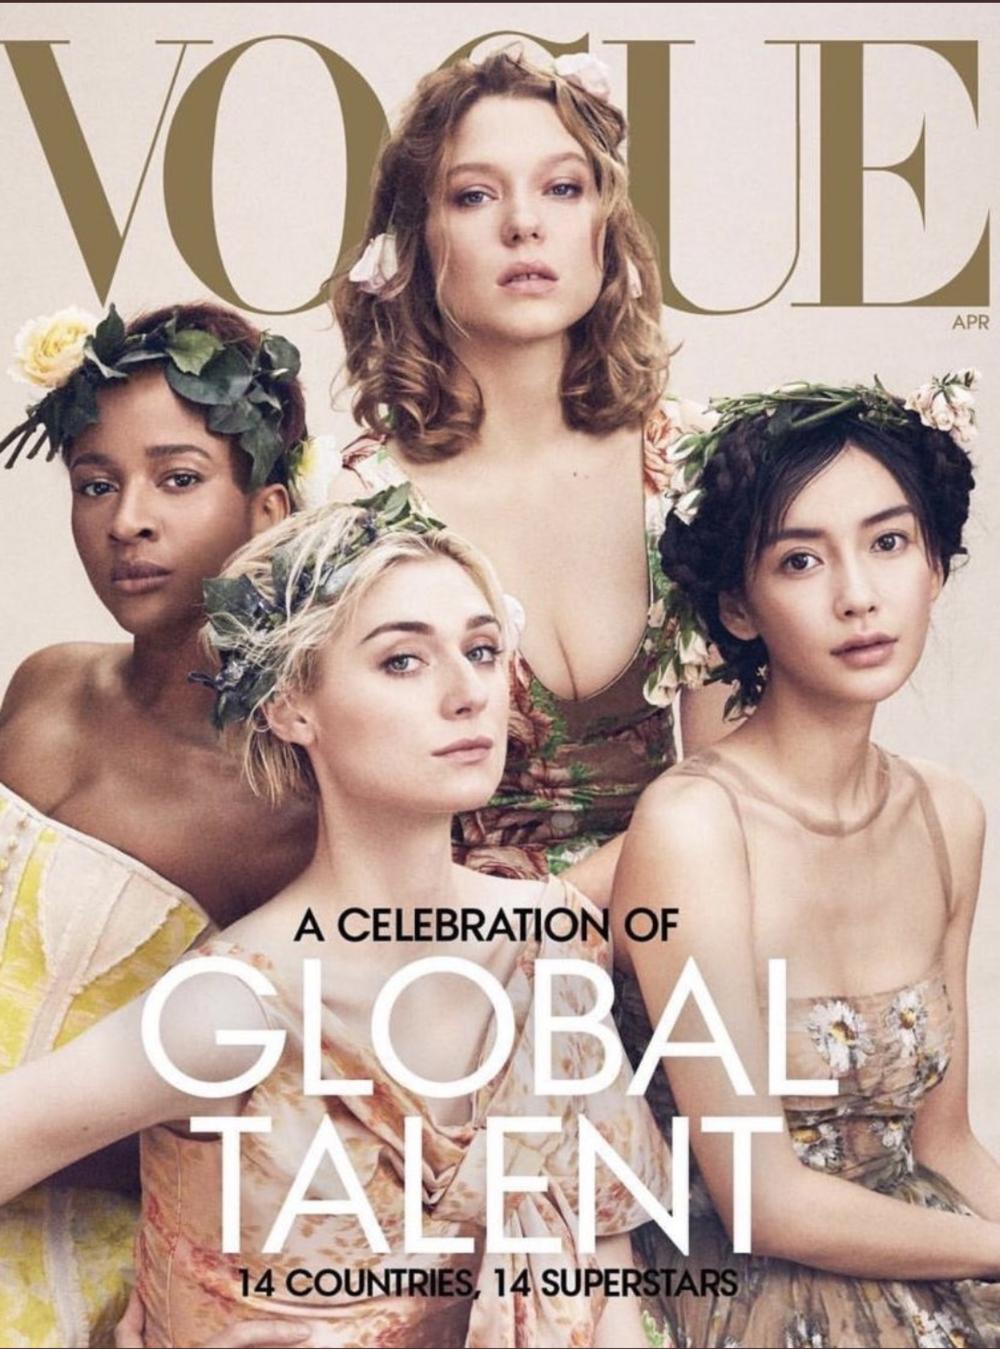 Image by Vogue magazine